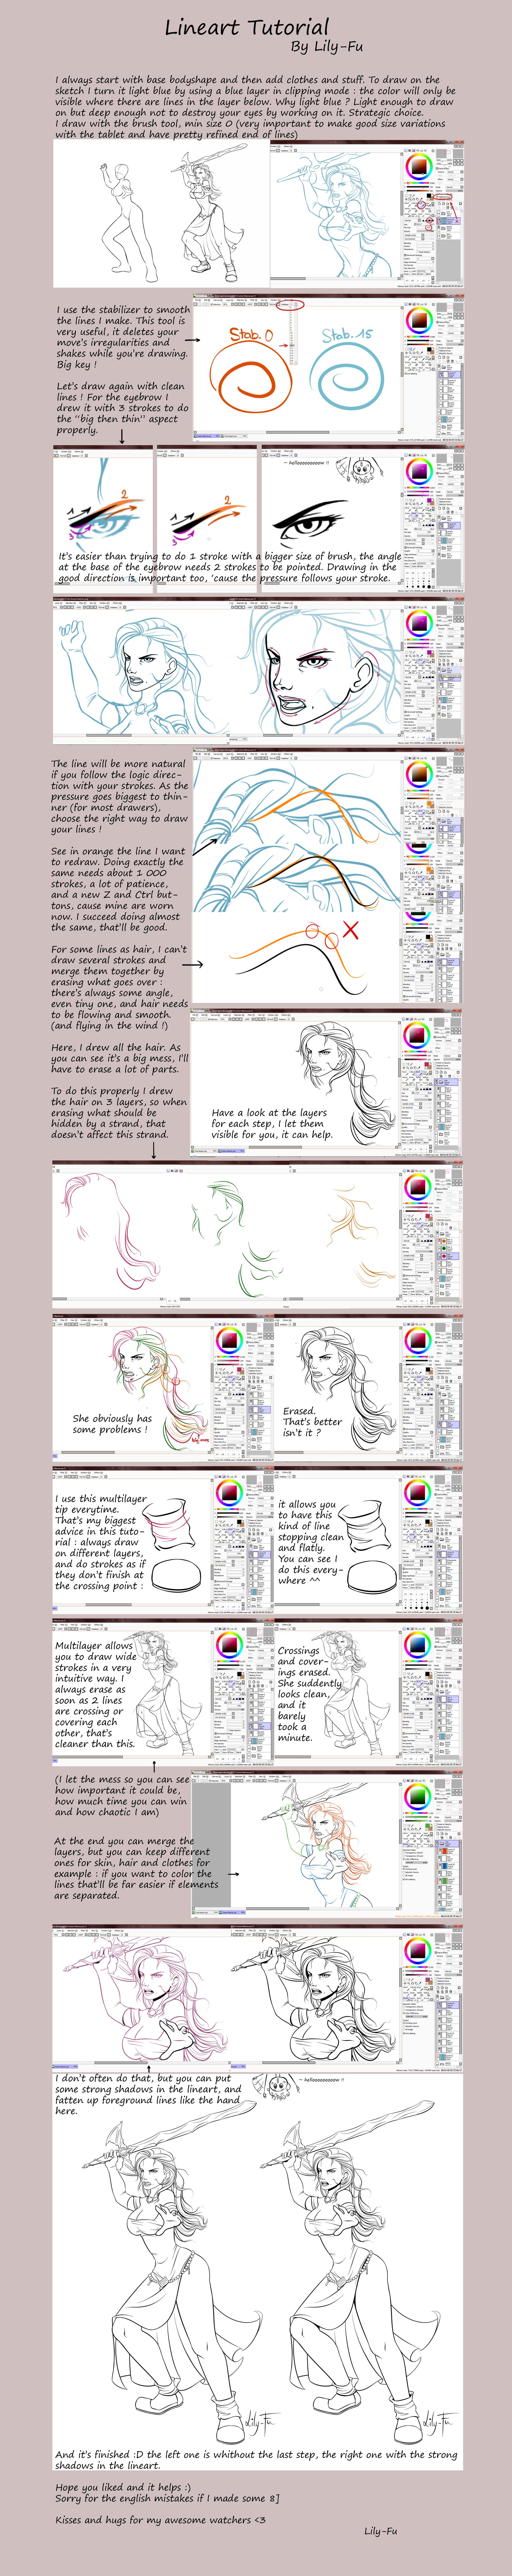 Paint tool sai on drawing tutorials deviantart joiachi 719 92 tutorial lineart on paint tool sai by lily fu baditri Gallery